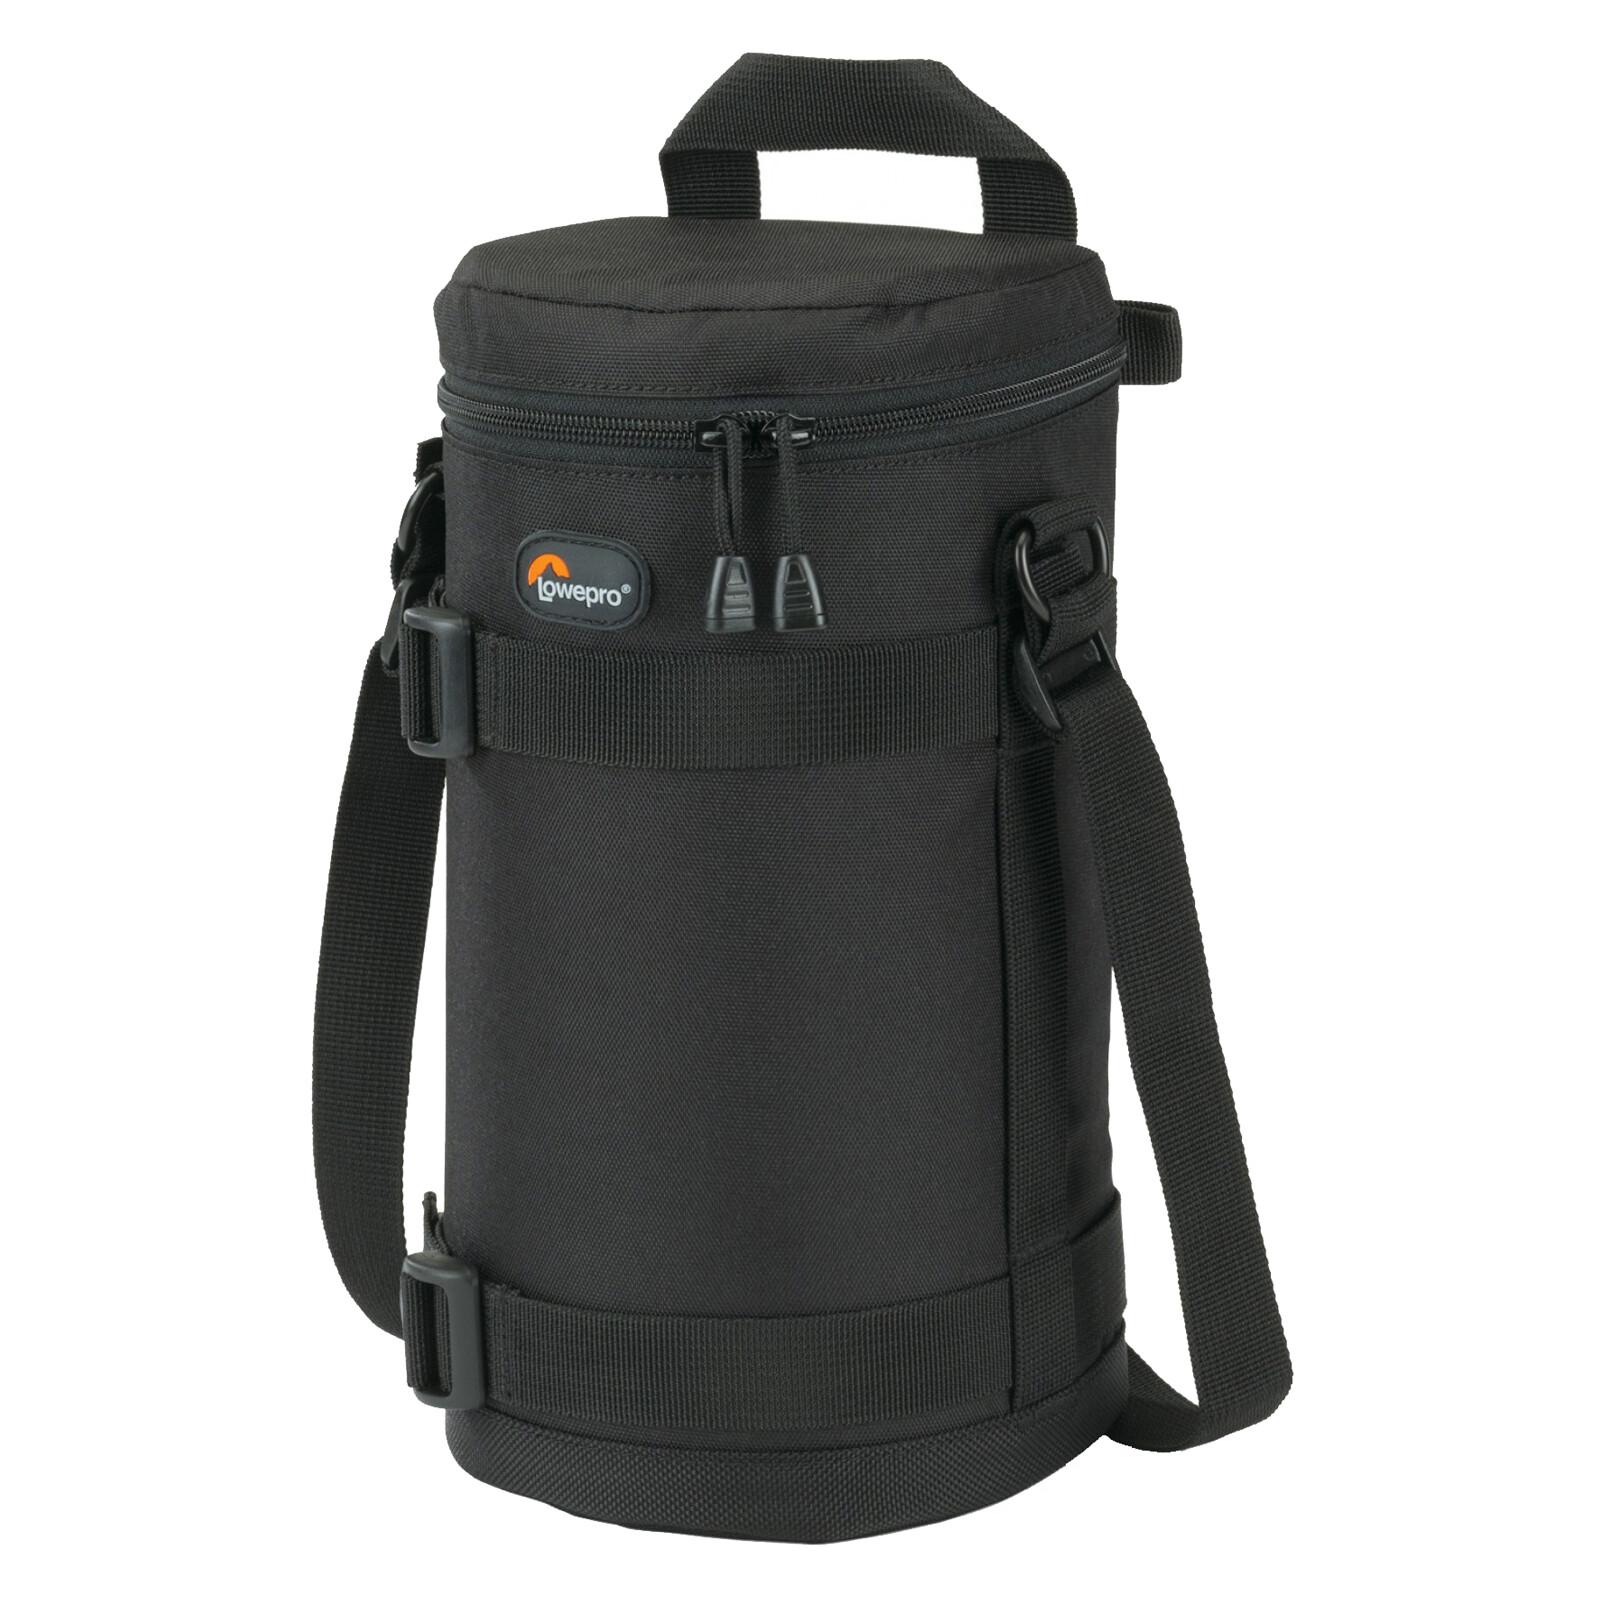 Lowepro 11x26 Lens Case